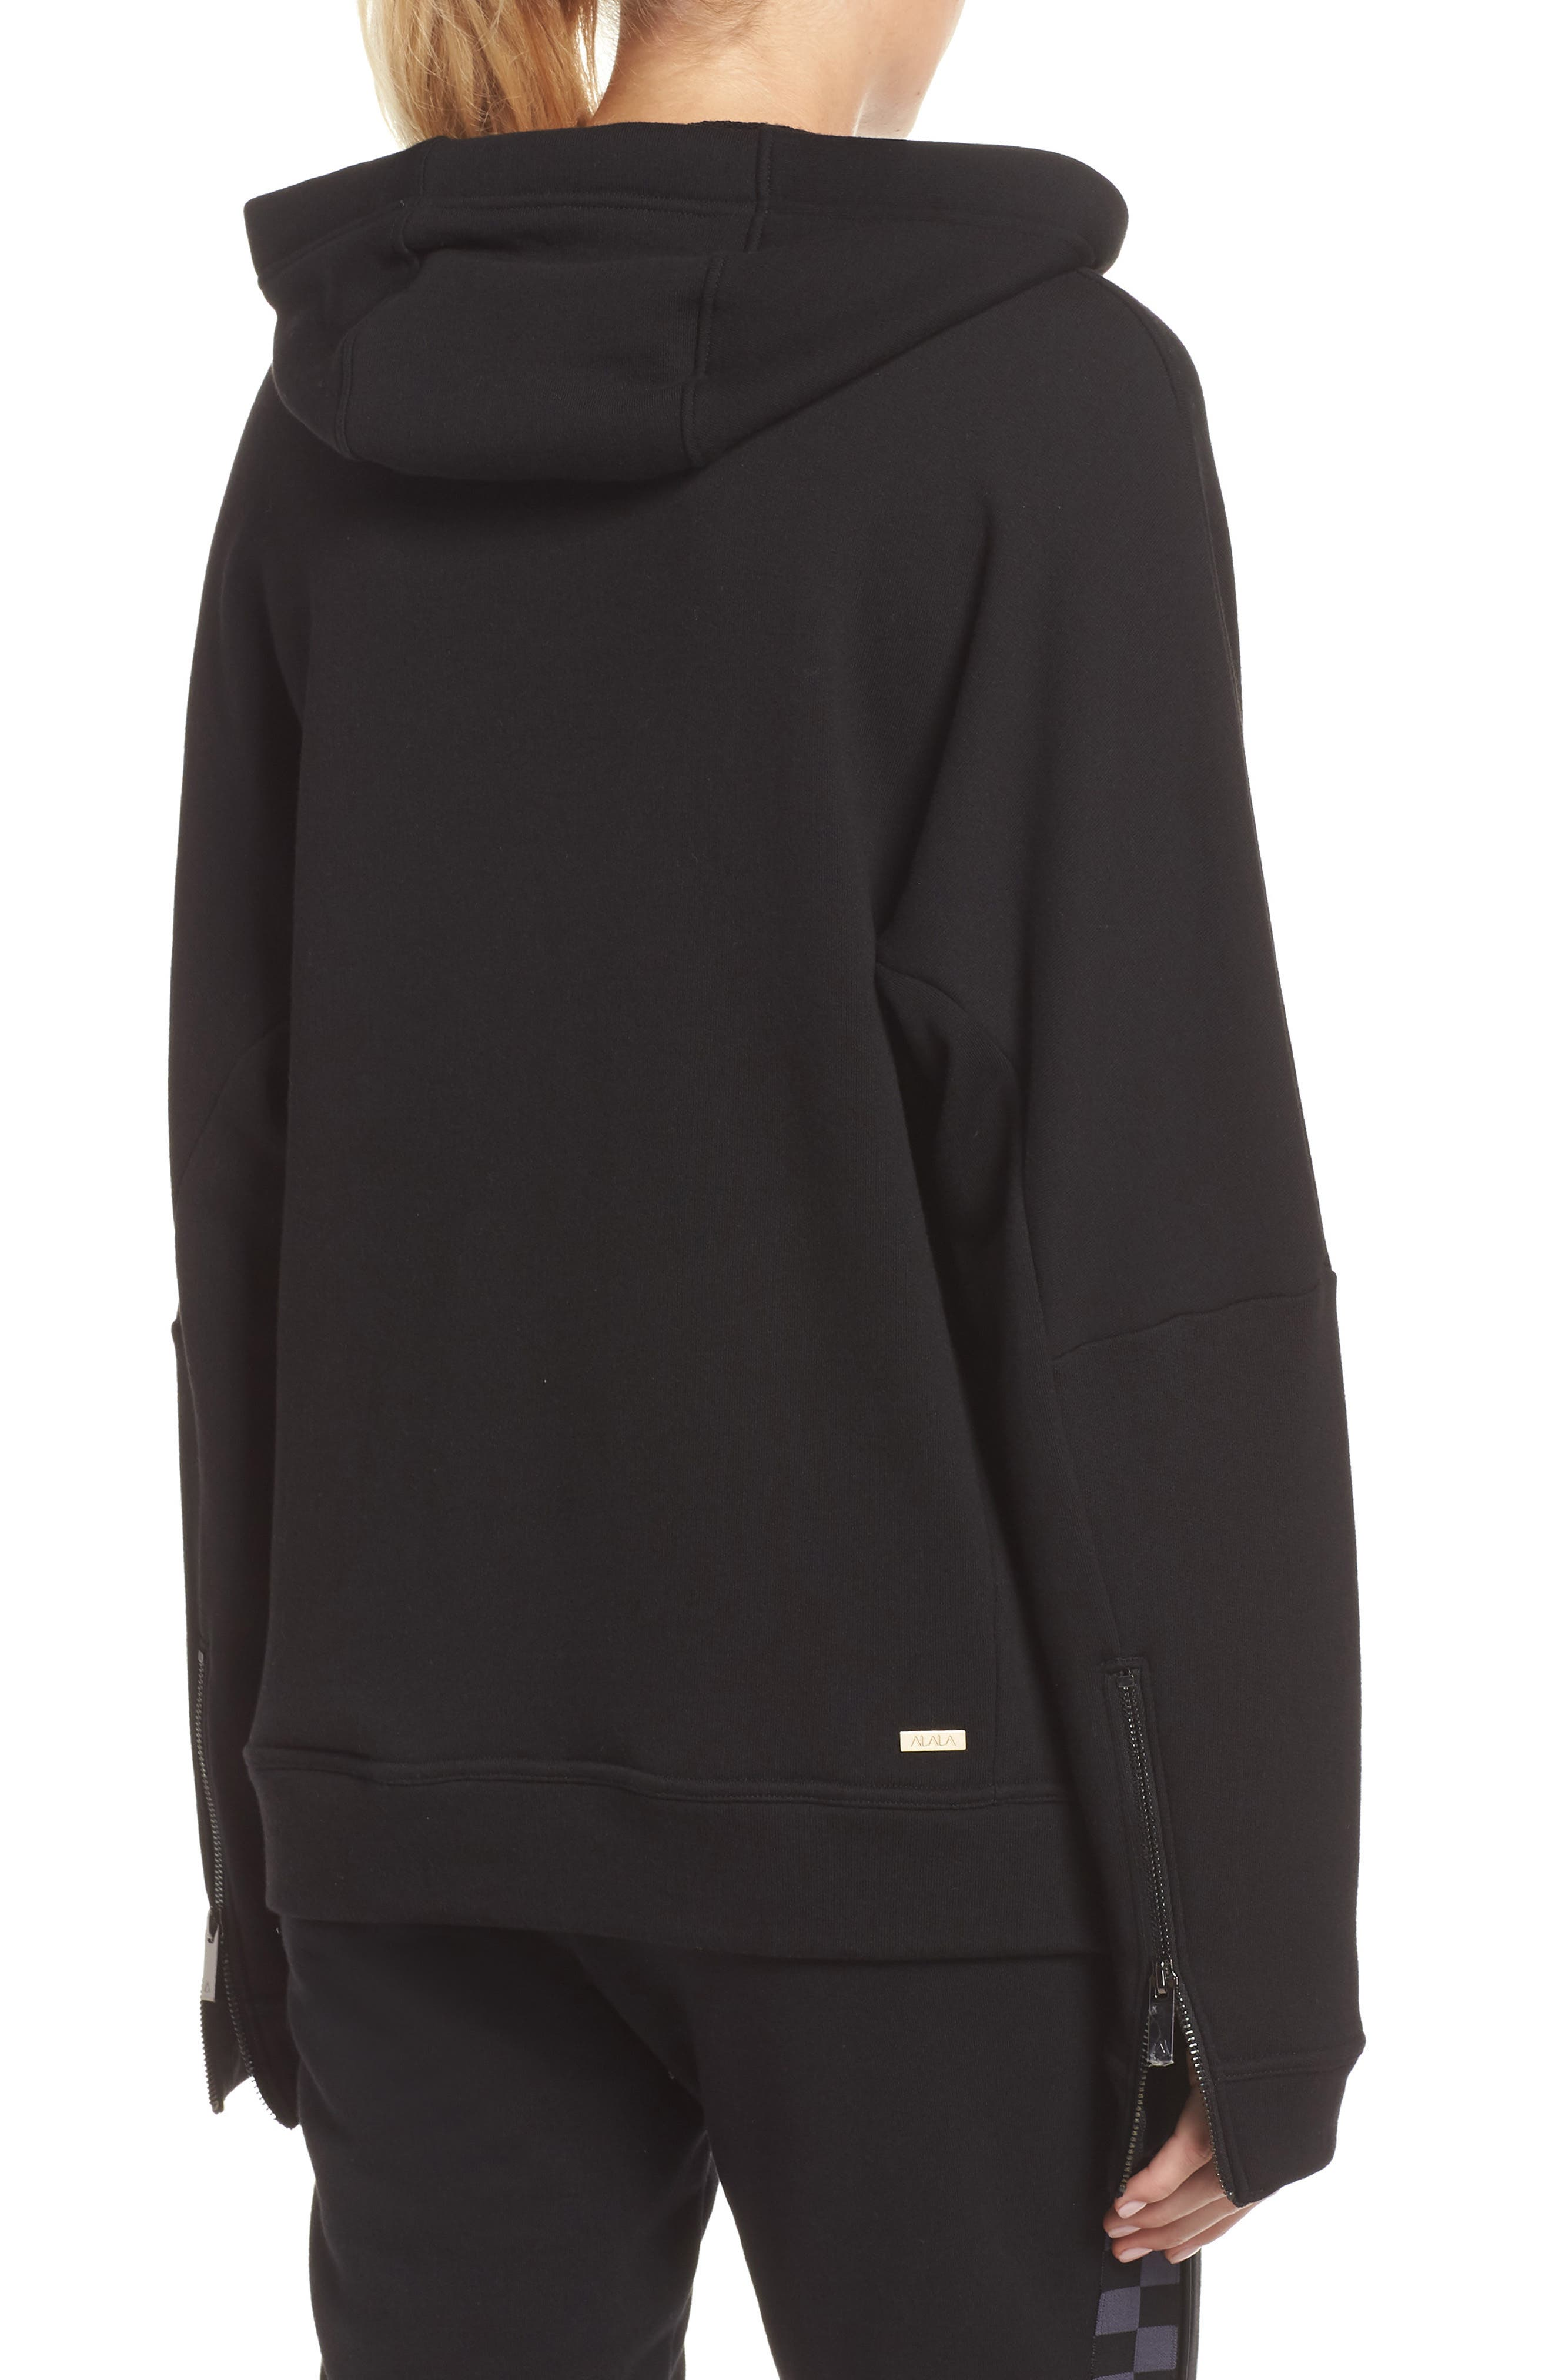 Shift Hoodie Sweatshirt,                             Alternate thumbnail 2, color,                             BLACK/ CHECKER